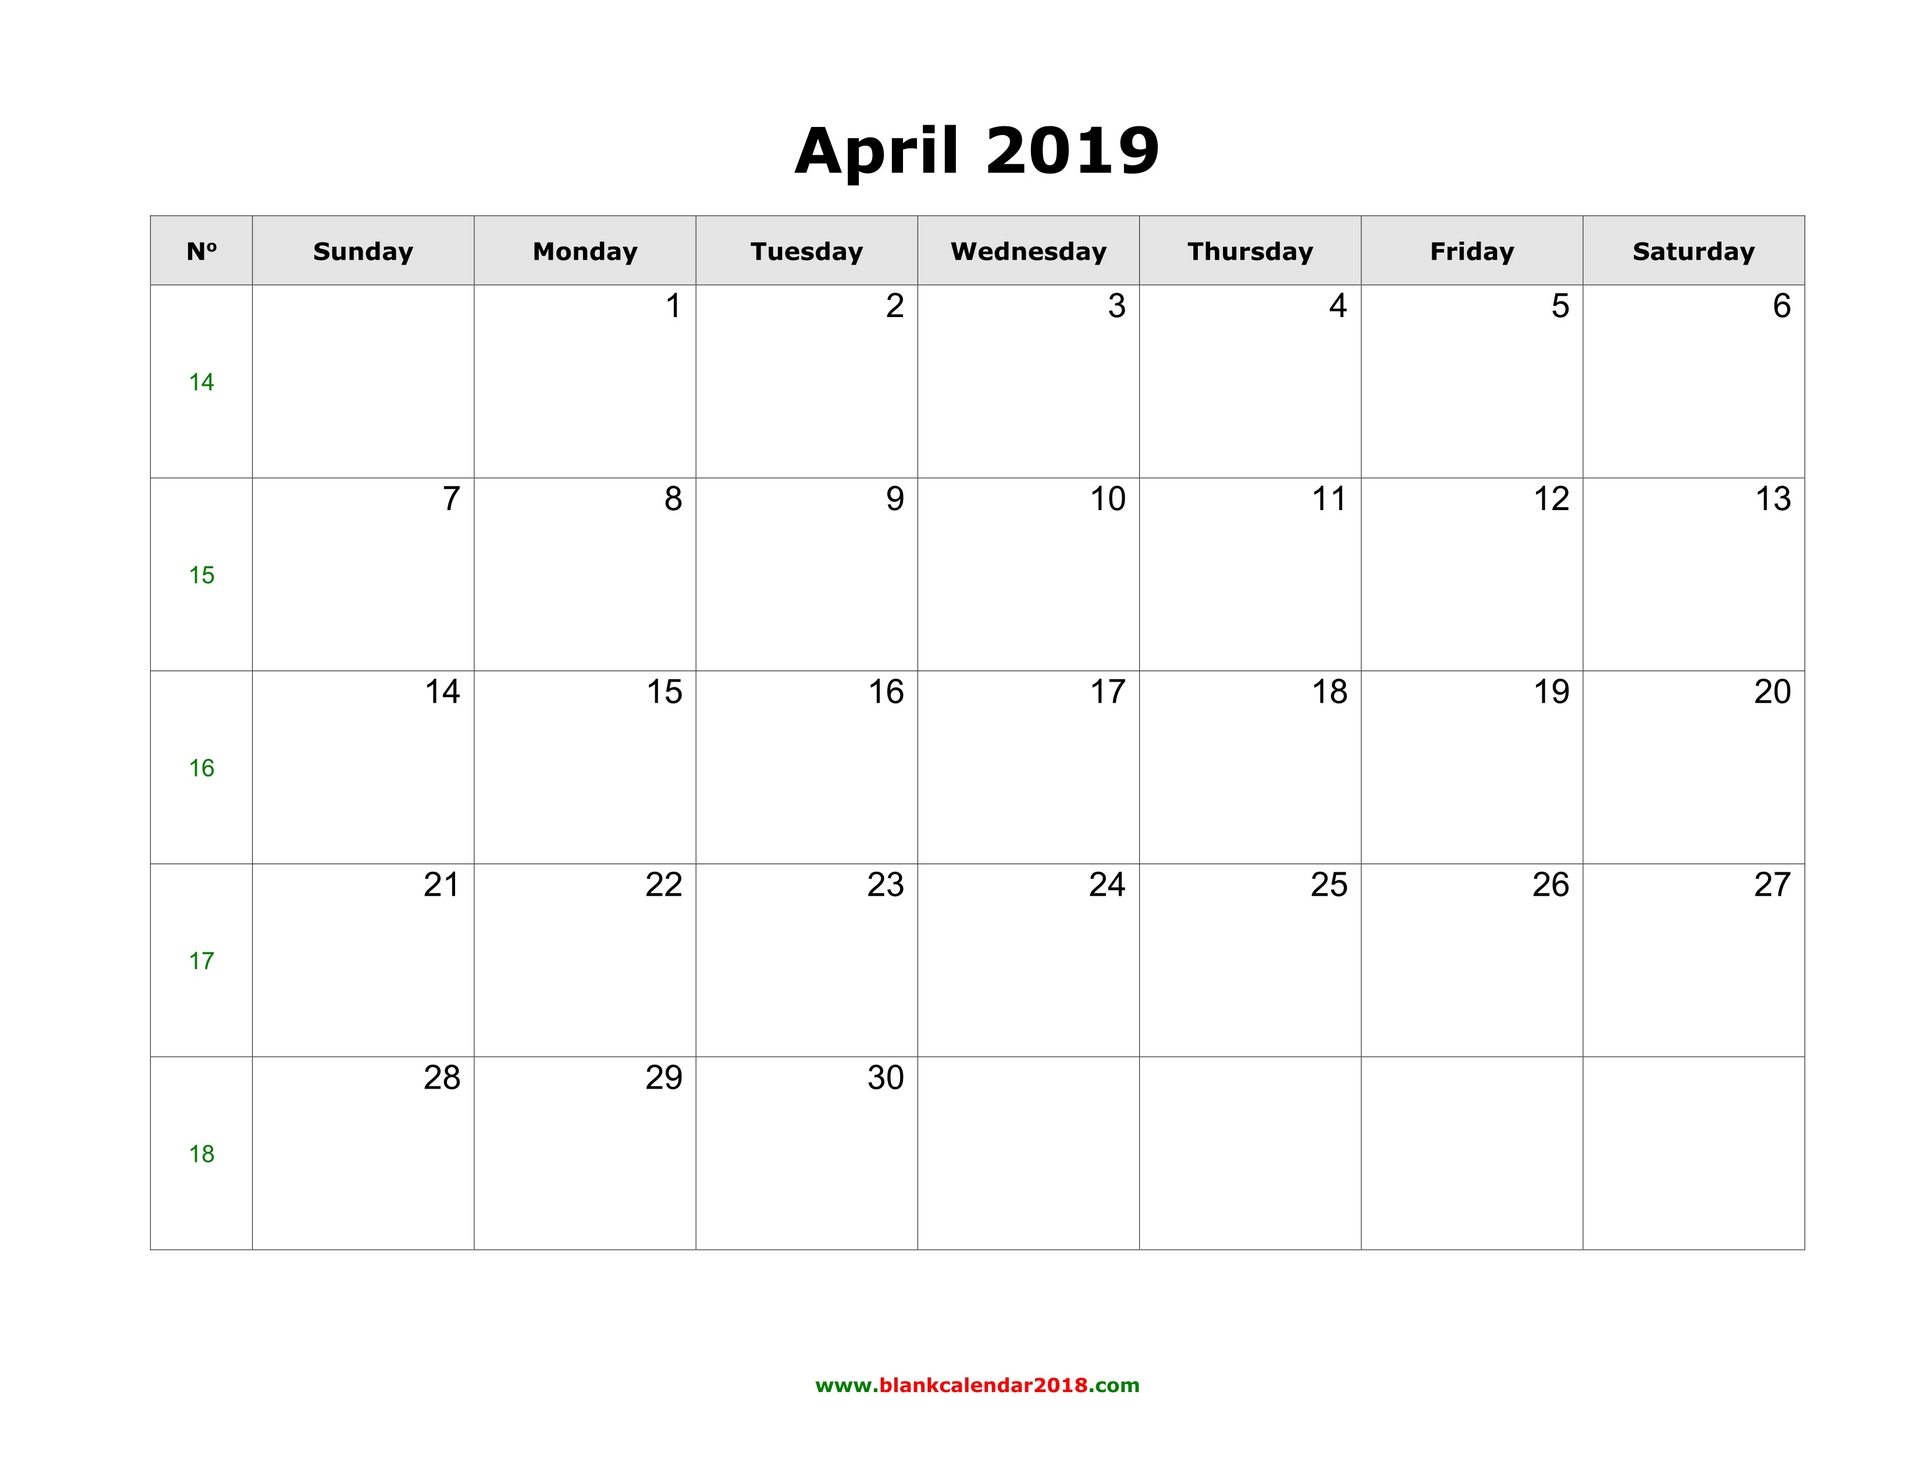 Blank Calendar For April 2019 inside Print Off A Blank Calendar For